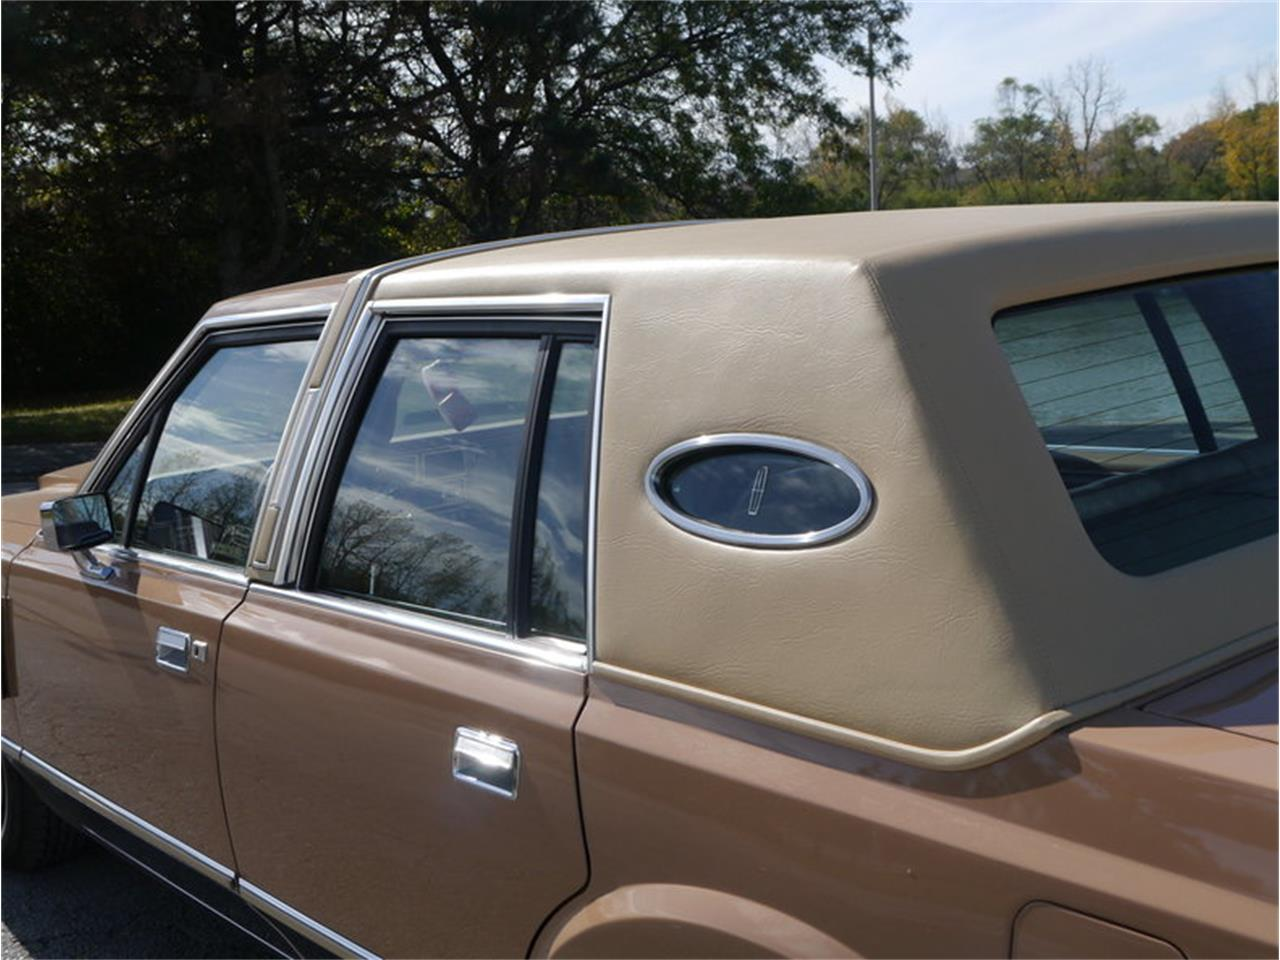 Large Picture of '83 Continental Mark VI located in Illinois - $7,900.00 - M7E3